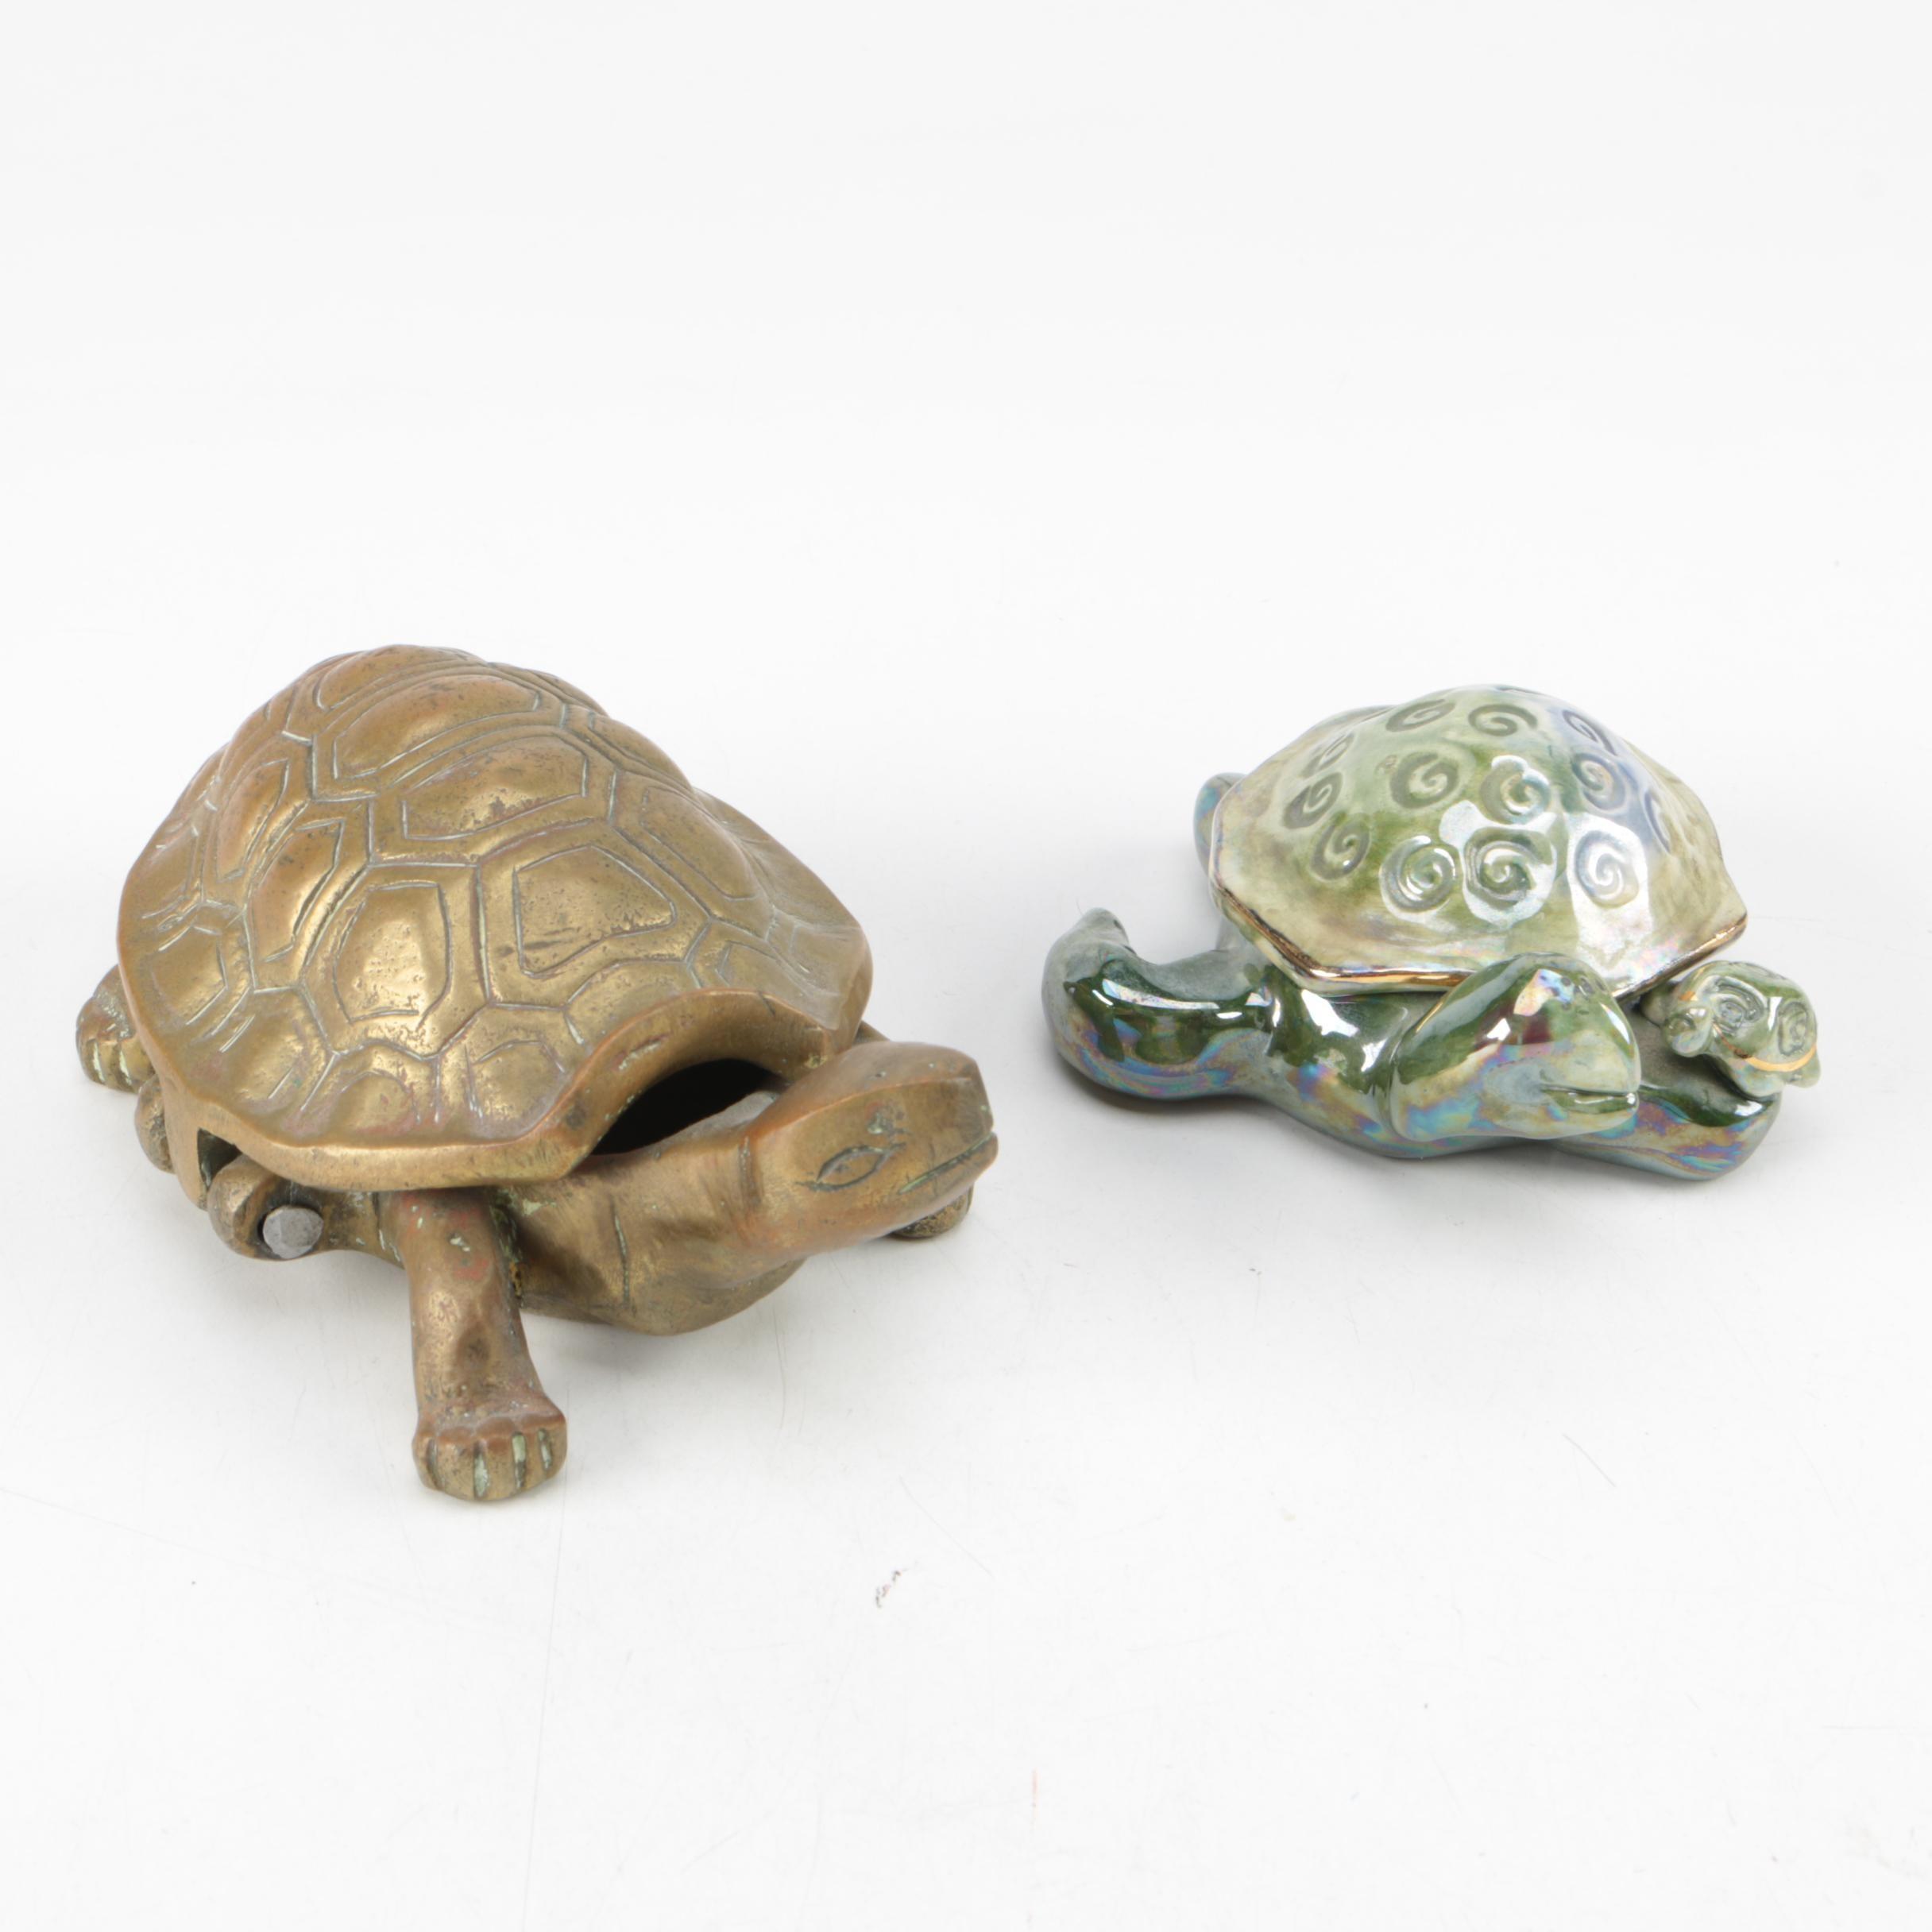 Pair of Turtle Trinket Box and Key Holder